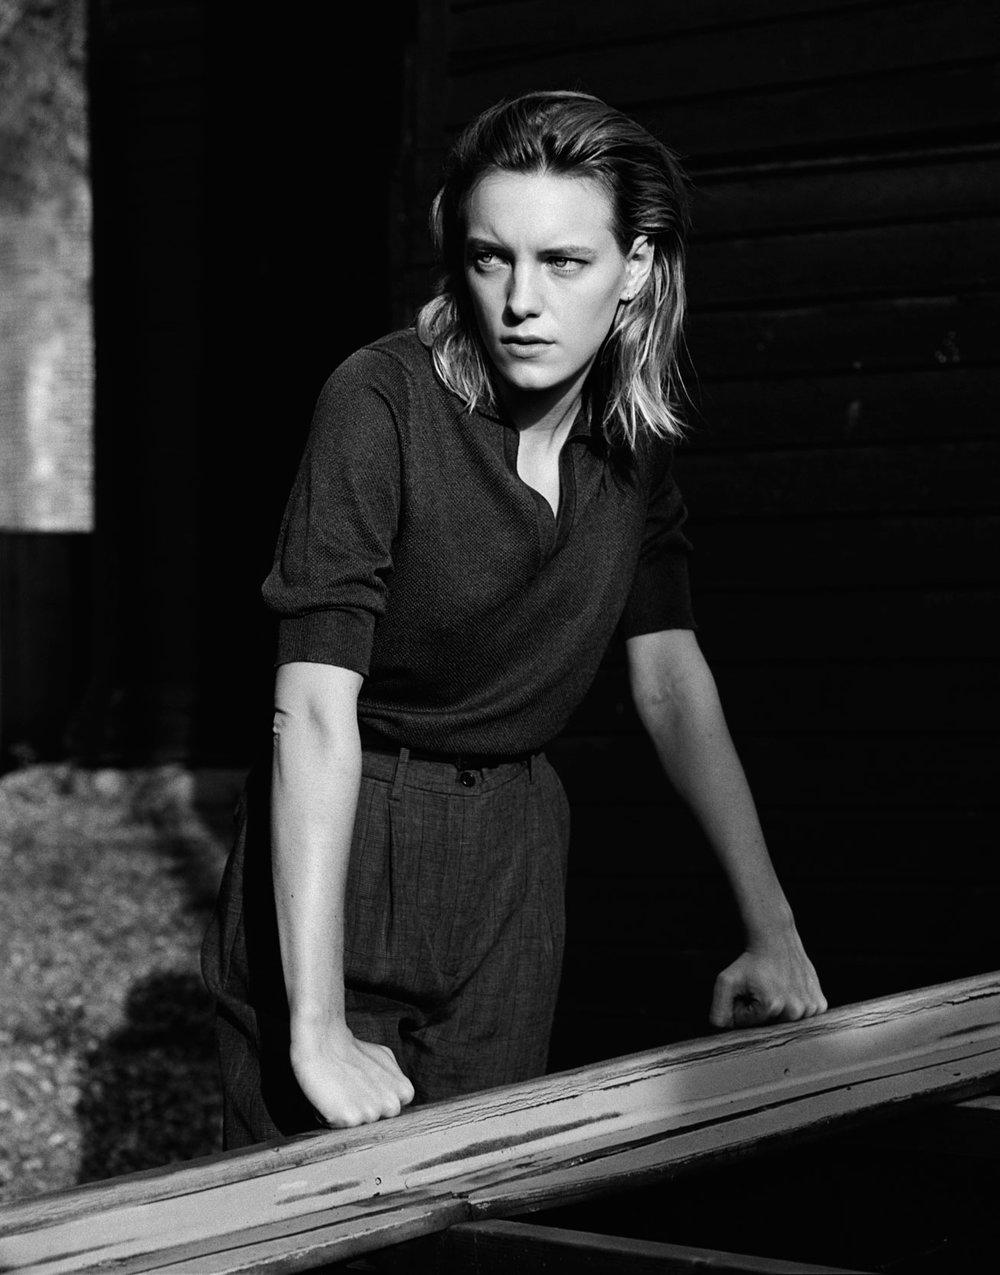 Margaret-Howell-Spring-Summer-2017-Campaign-2.jpg